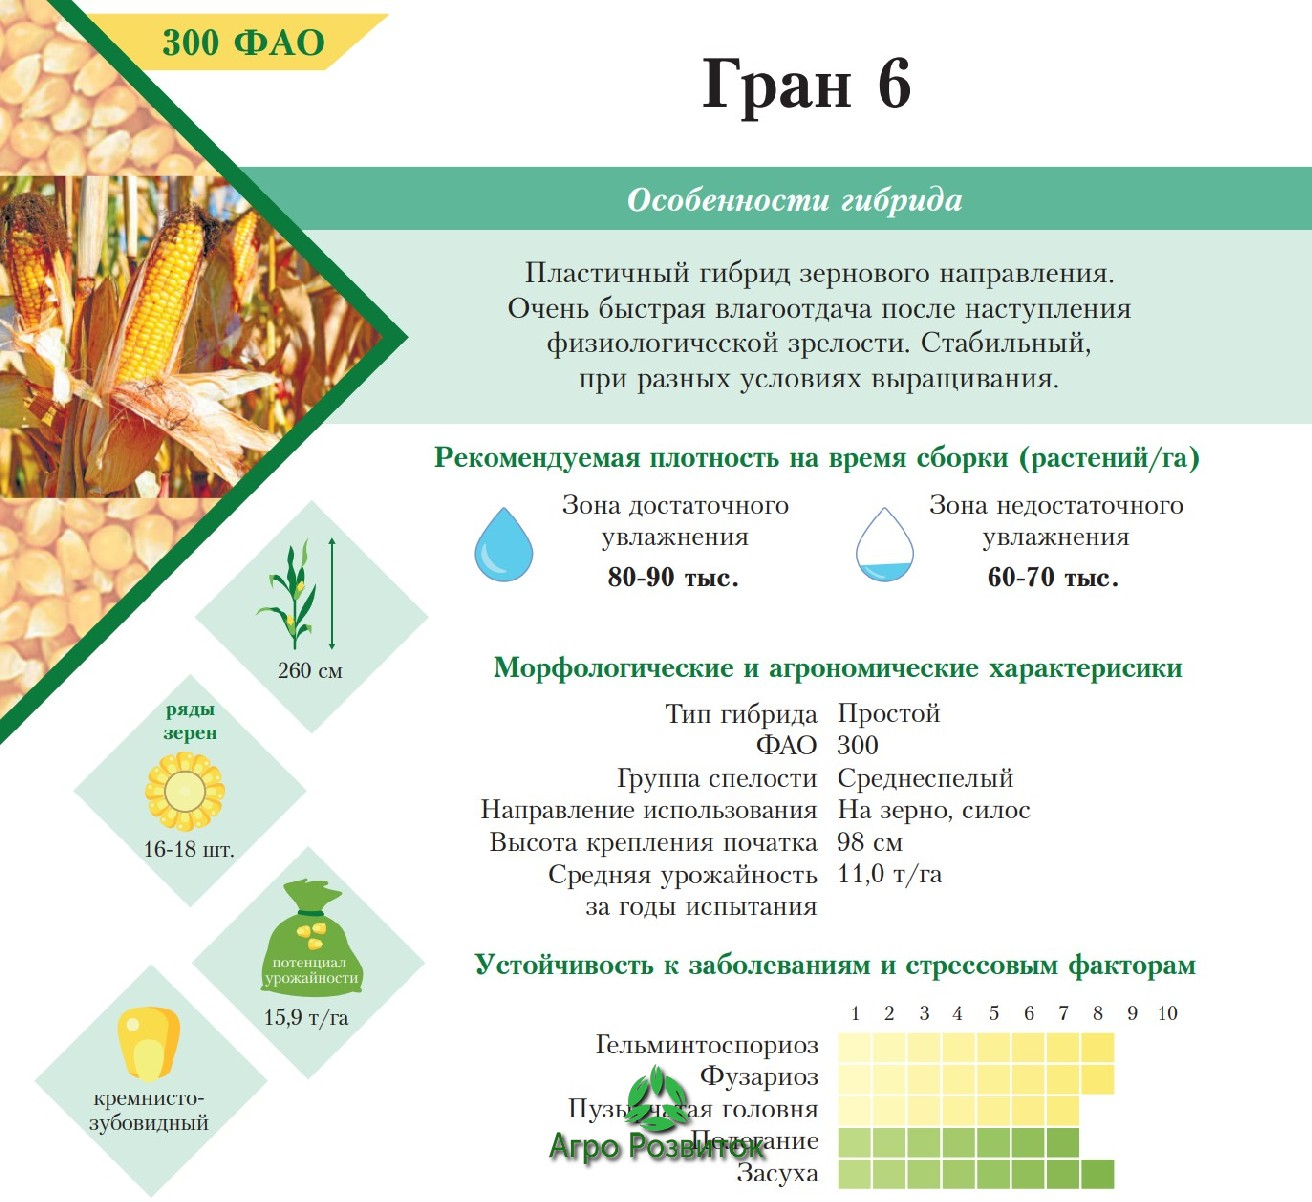 Кукуруза Гран 6 - Цена Семян (ФАО 300)